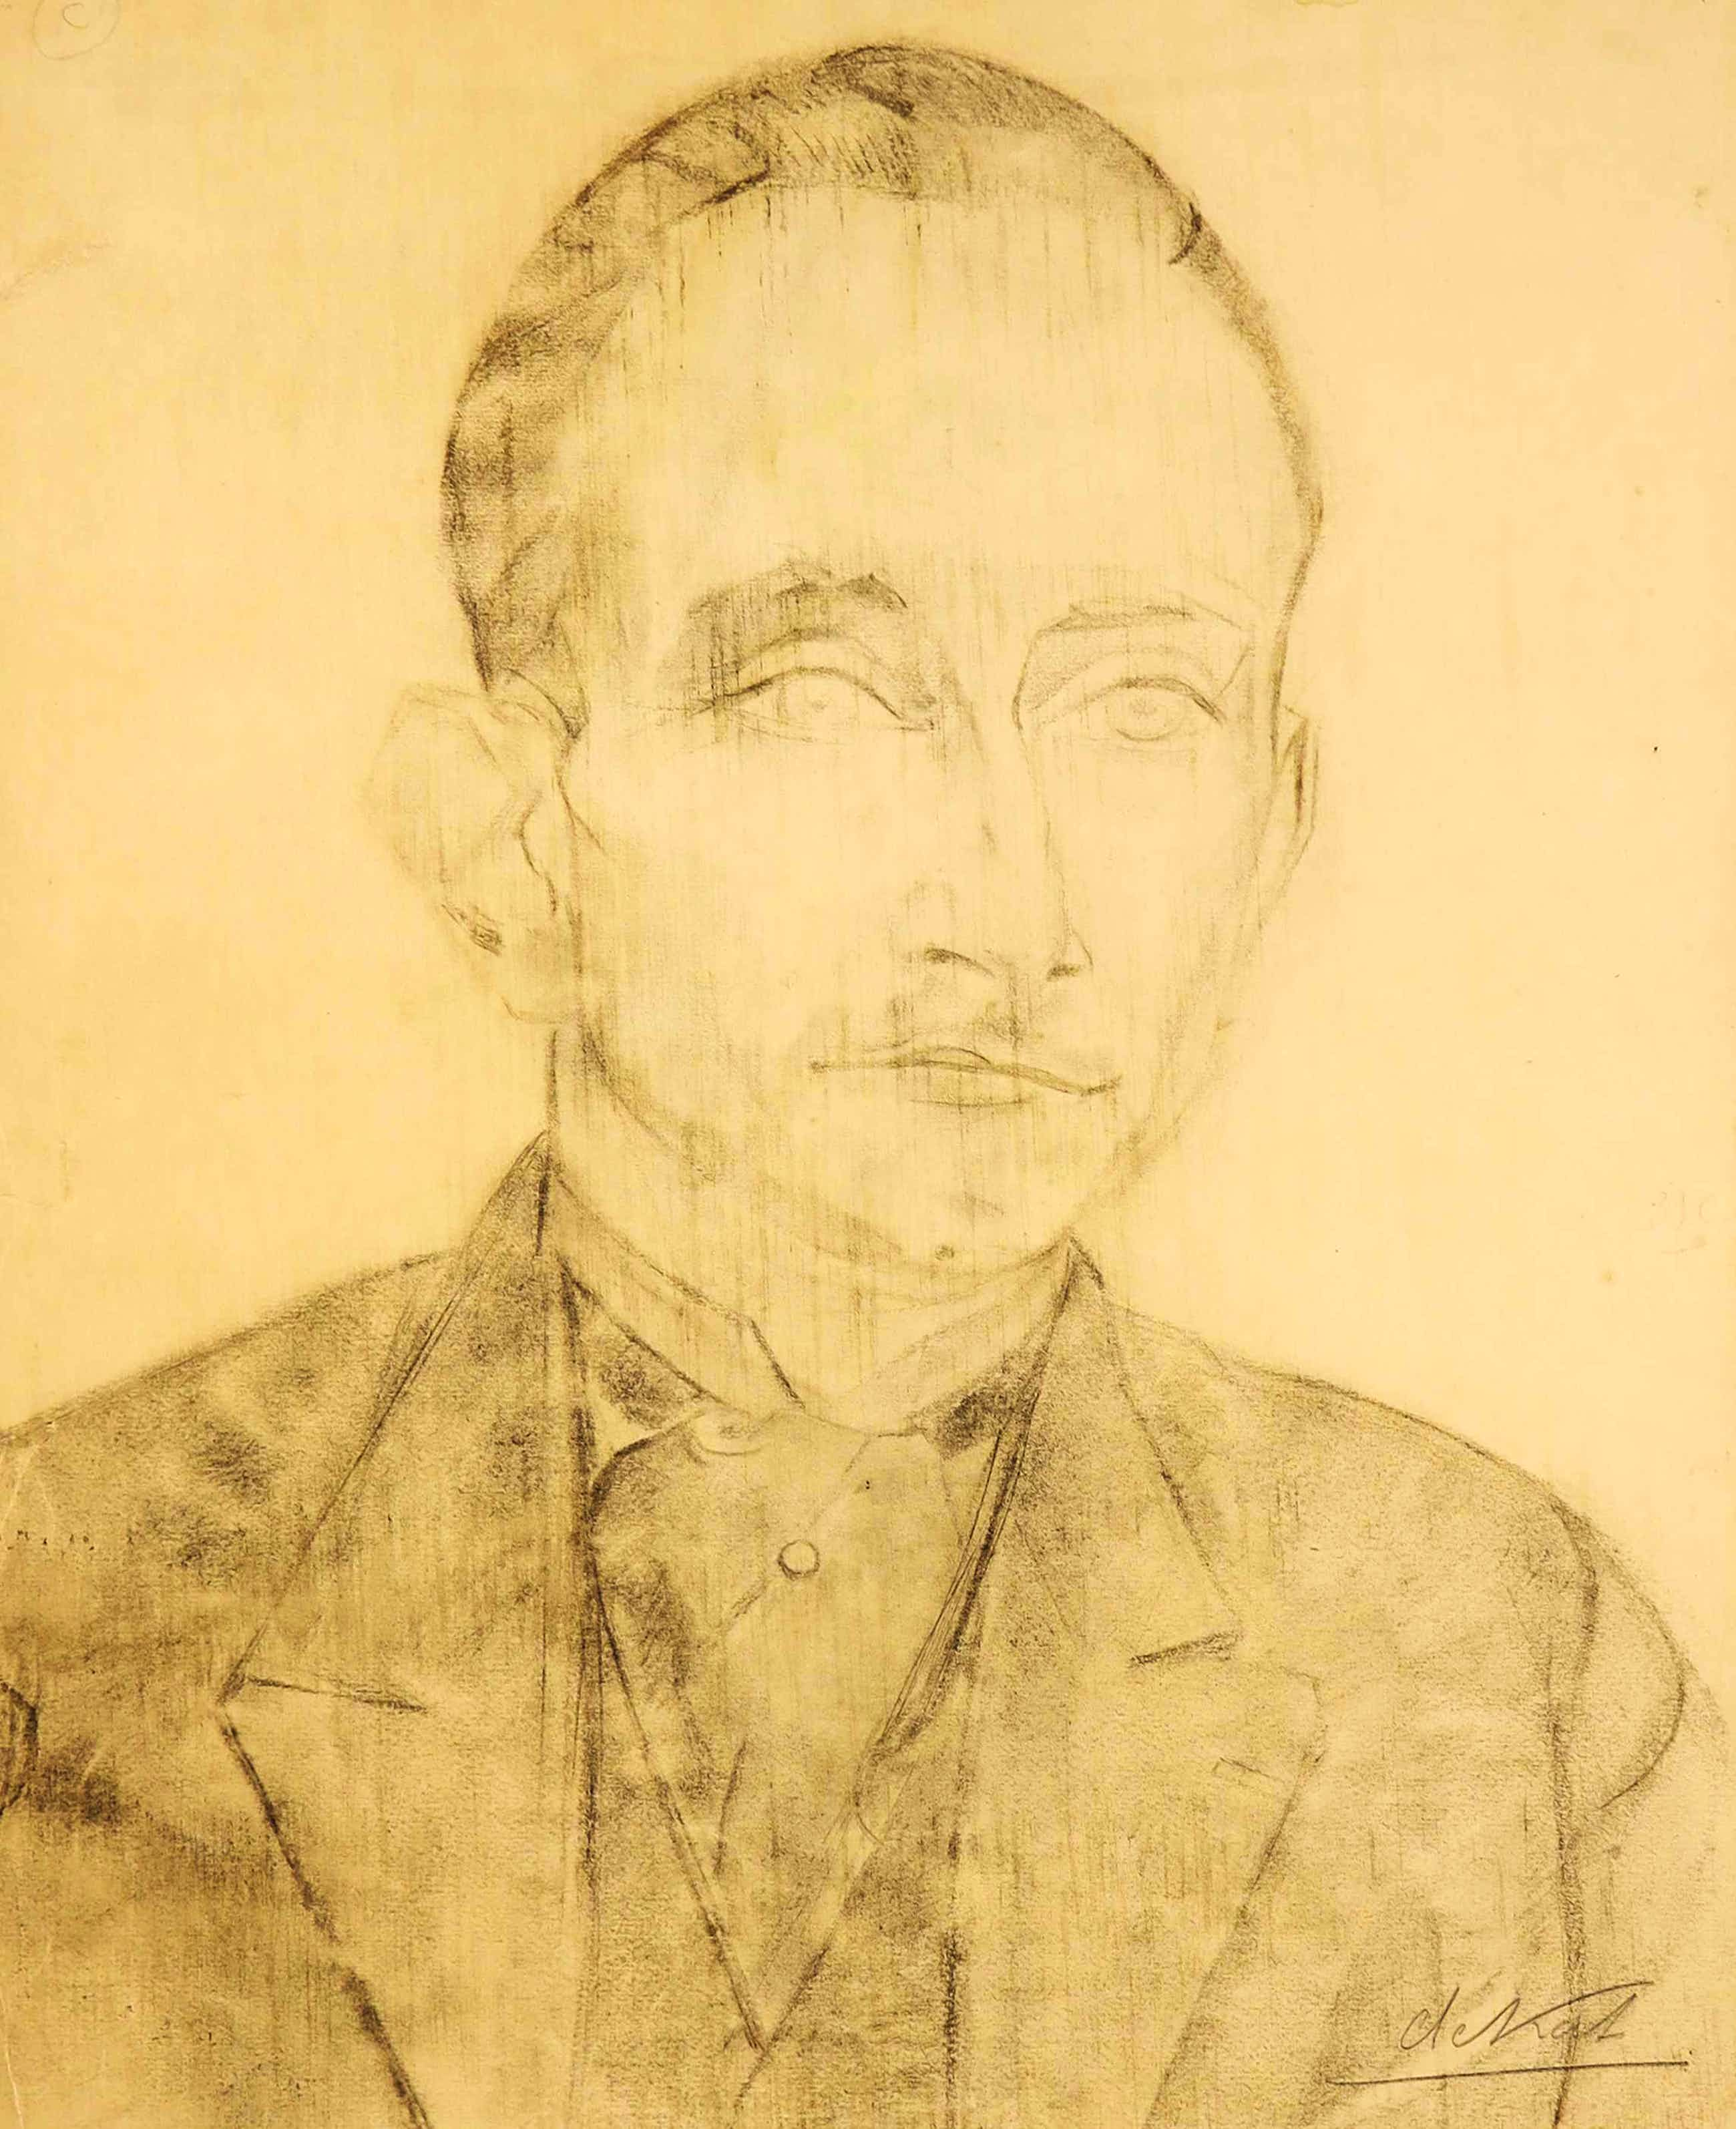 Anne-Pierre De Kat - Houtskooltekening, Portret kopen? Bied vanaf 150!